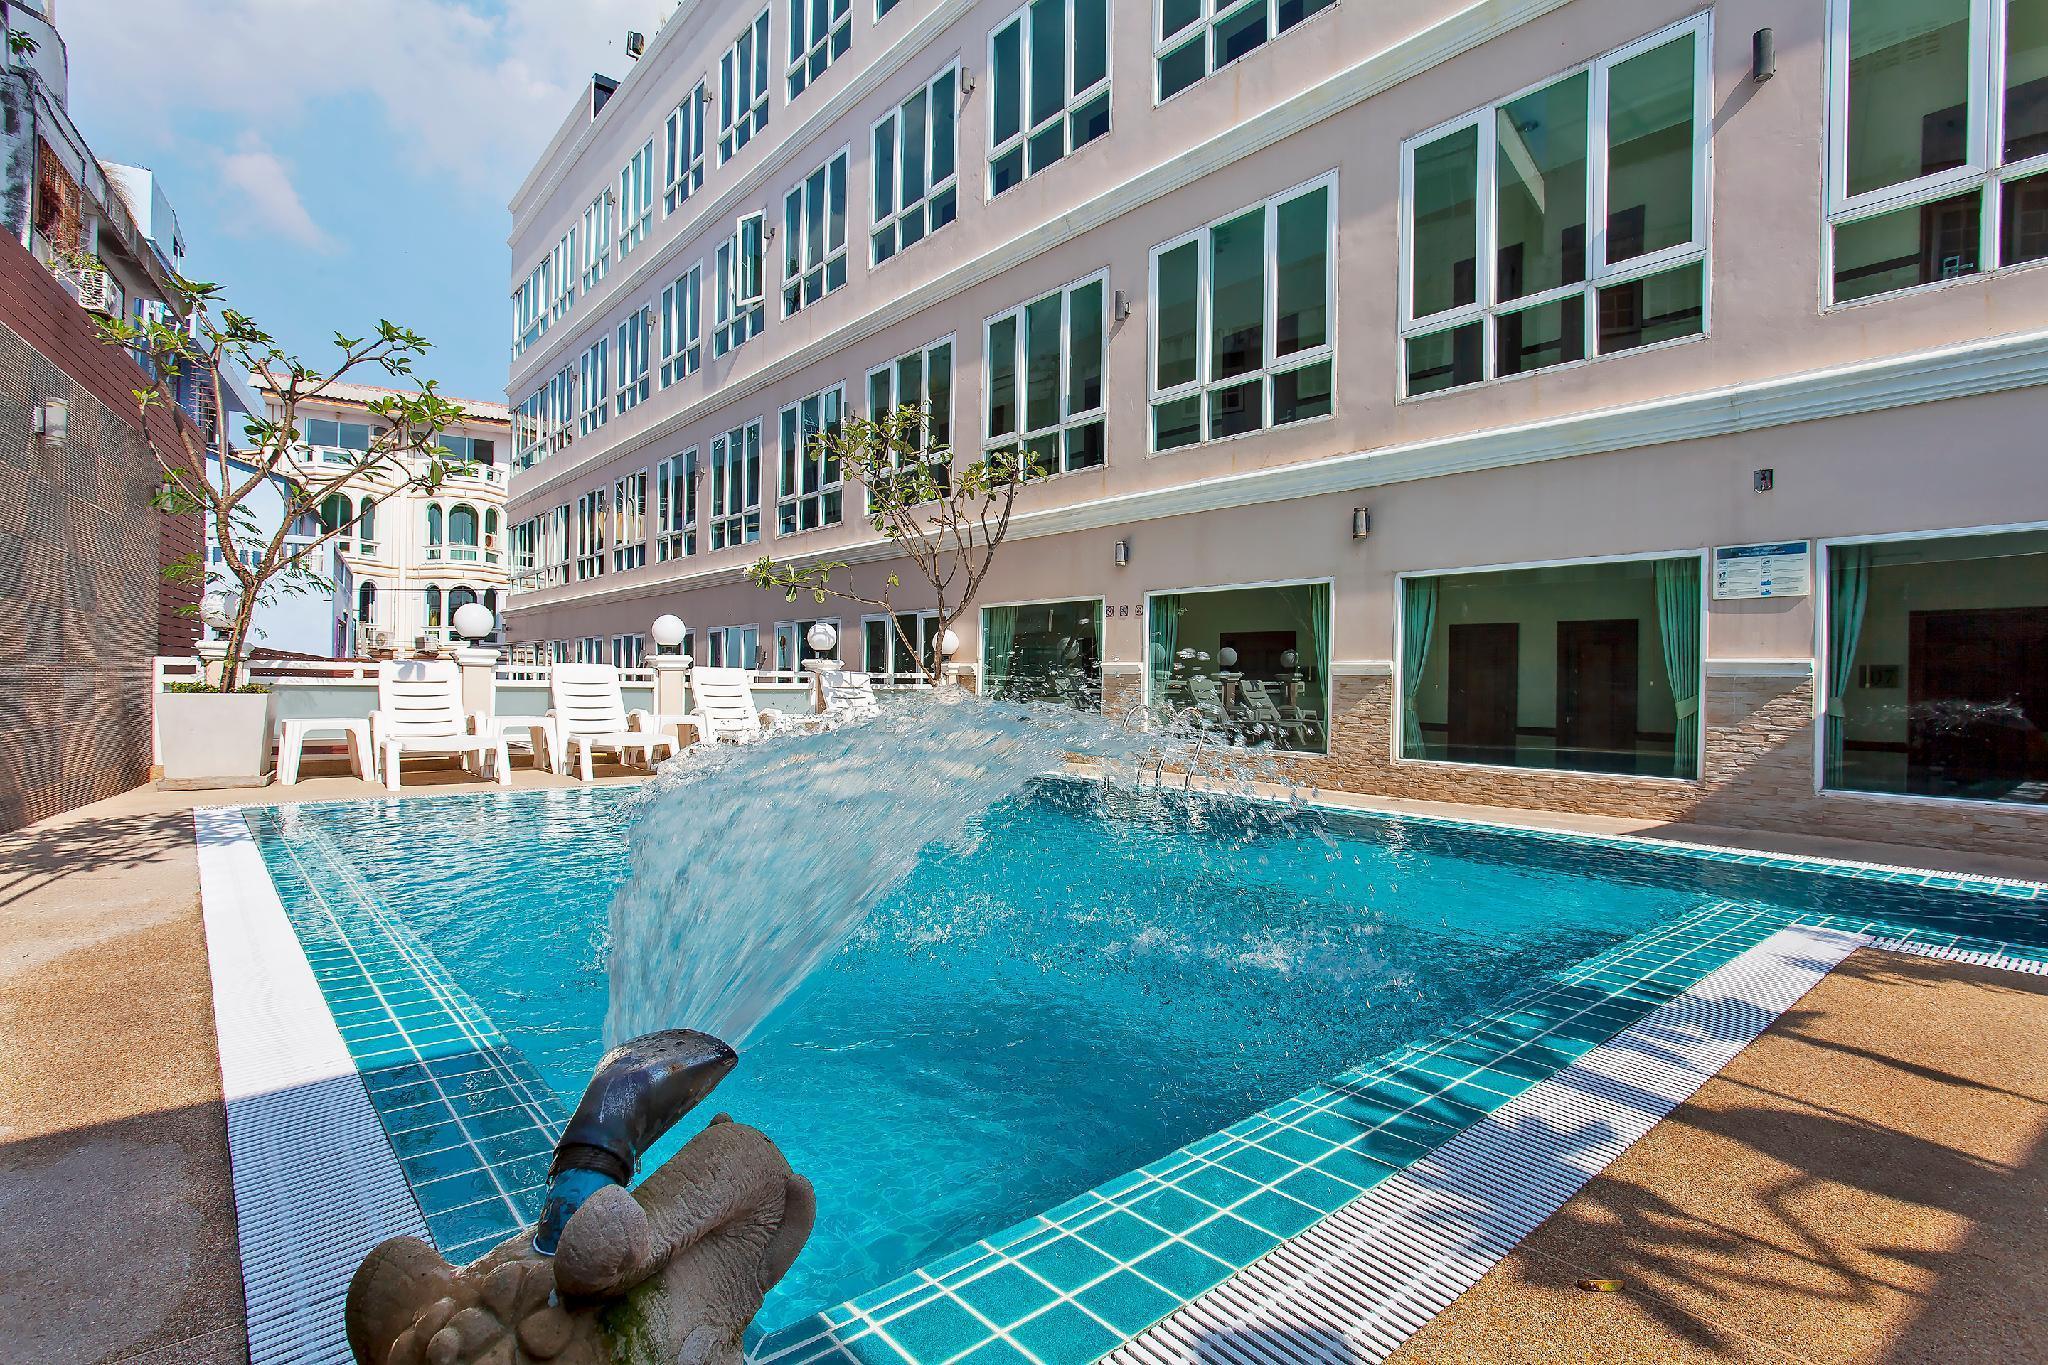 Purple Sky Resort | 18BR w Pool & Rooftop Lounge วิลลา 18 ห้องนอน 18 ห้องน้ำส่วนตัว ขนาด 1100 ตร.ม. – หาดจอมเทียน